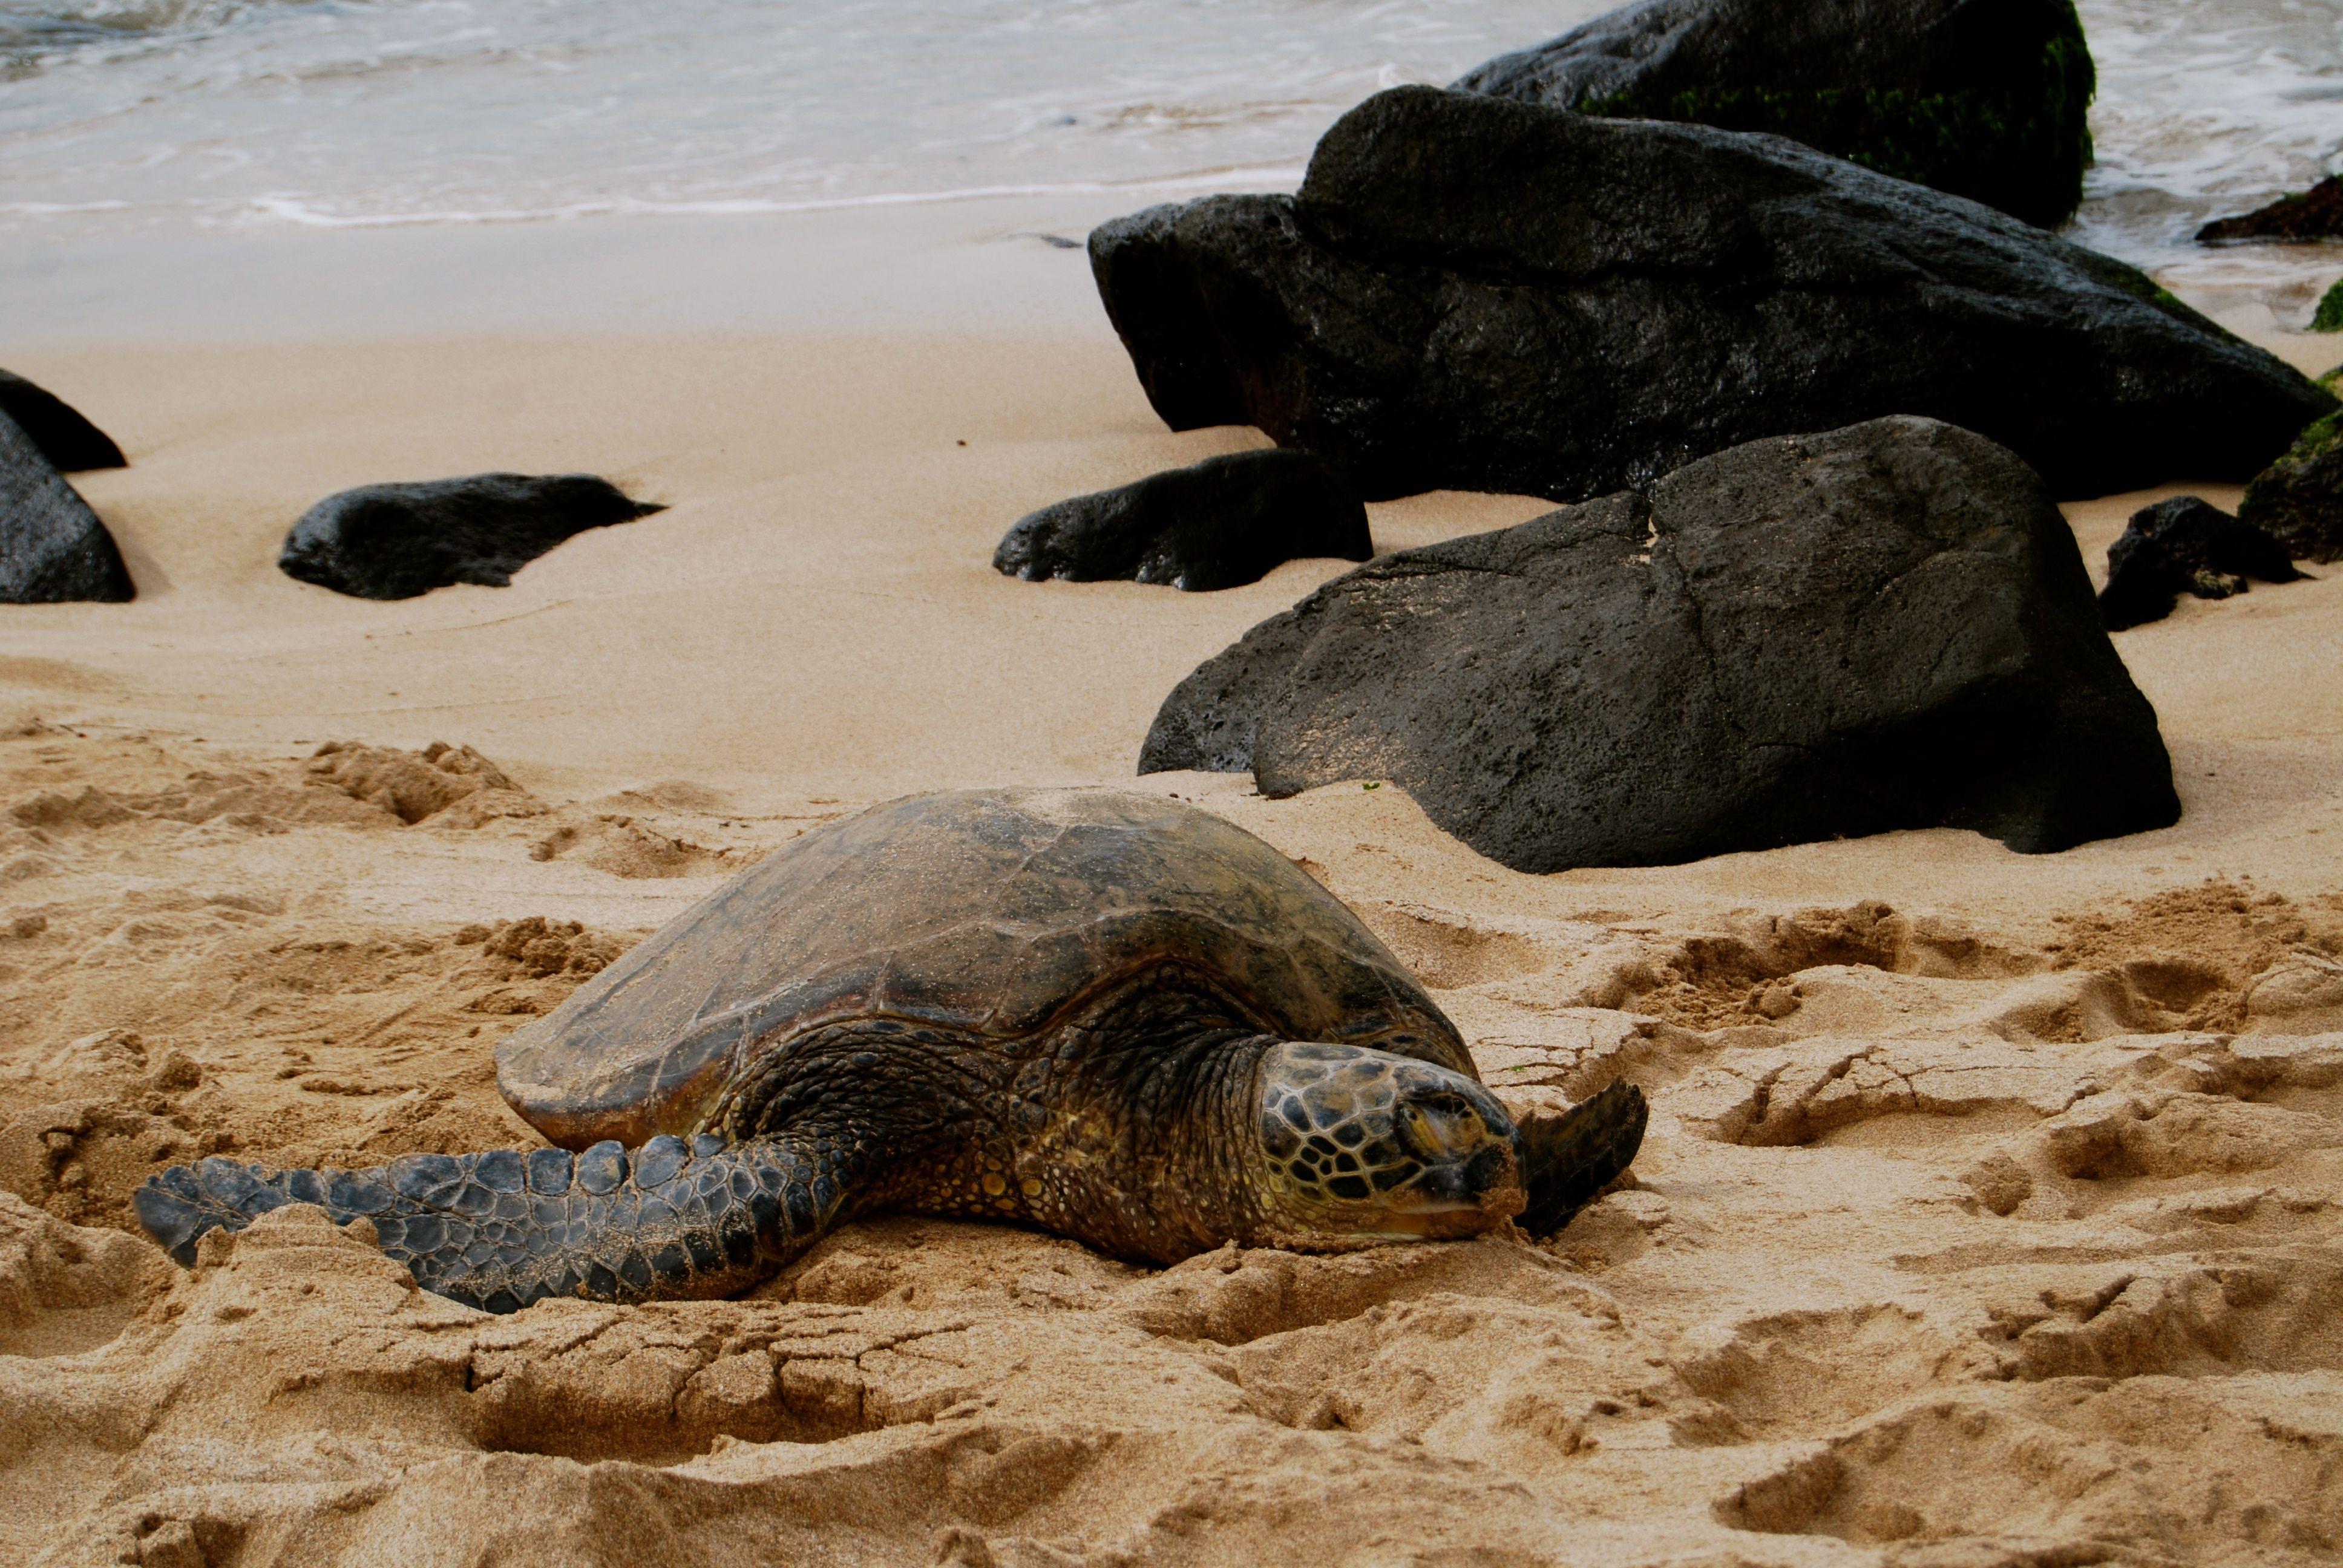 North Shore day trip Turtle Beach, Oahu, HI. Turtle